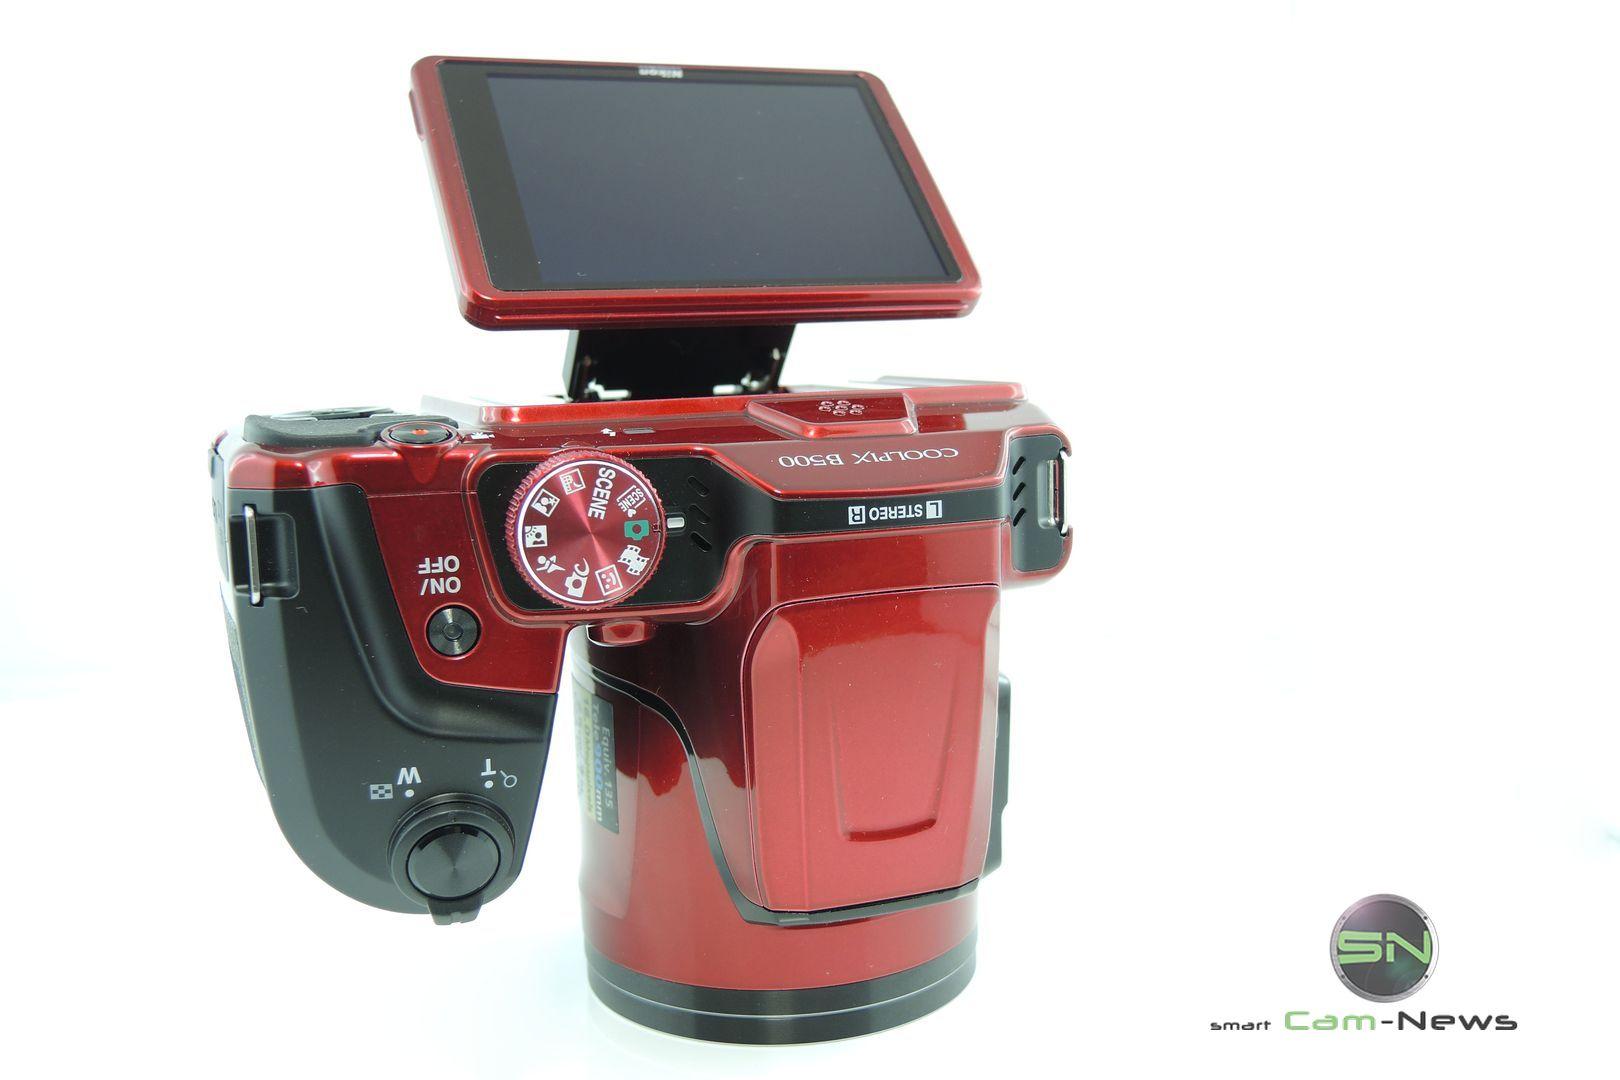 alles-im-blick-nikon-b500-smartcamnews